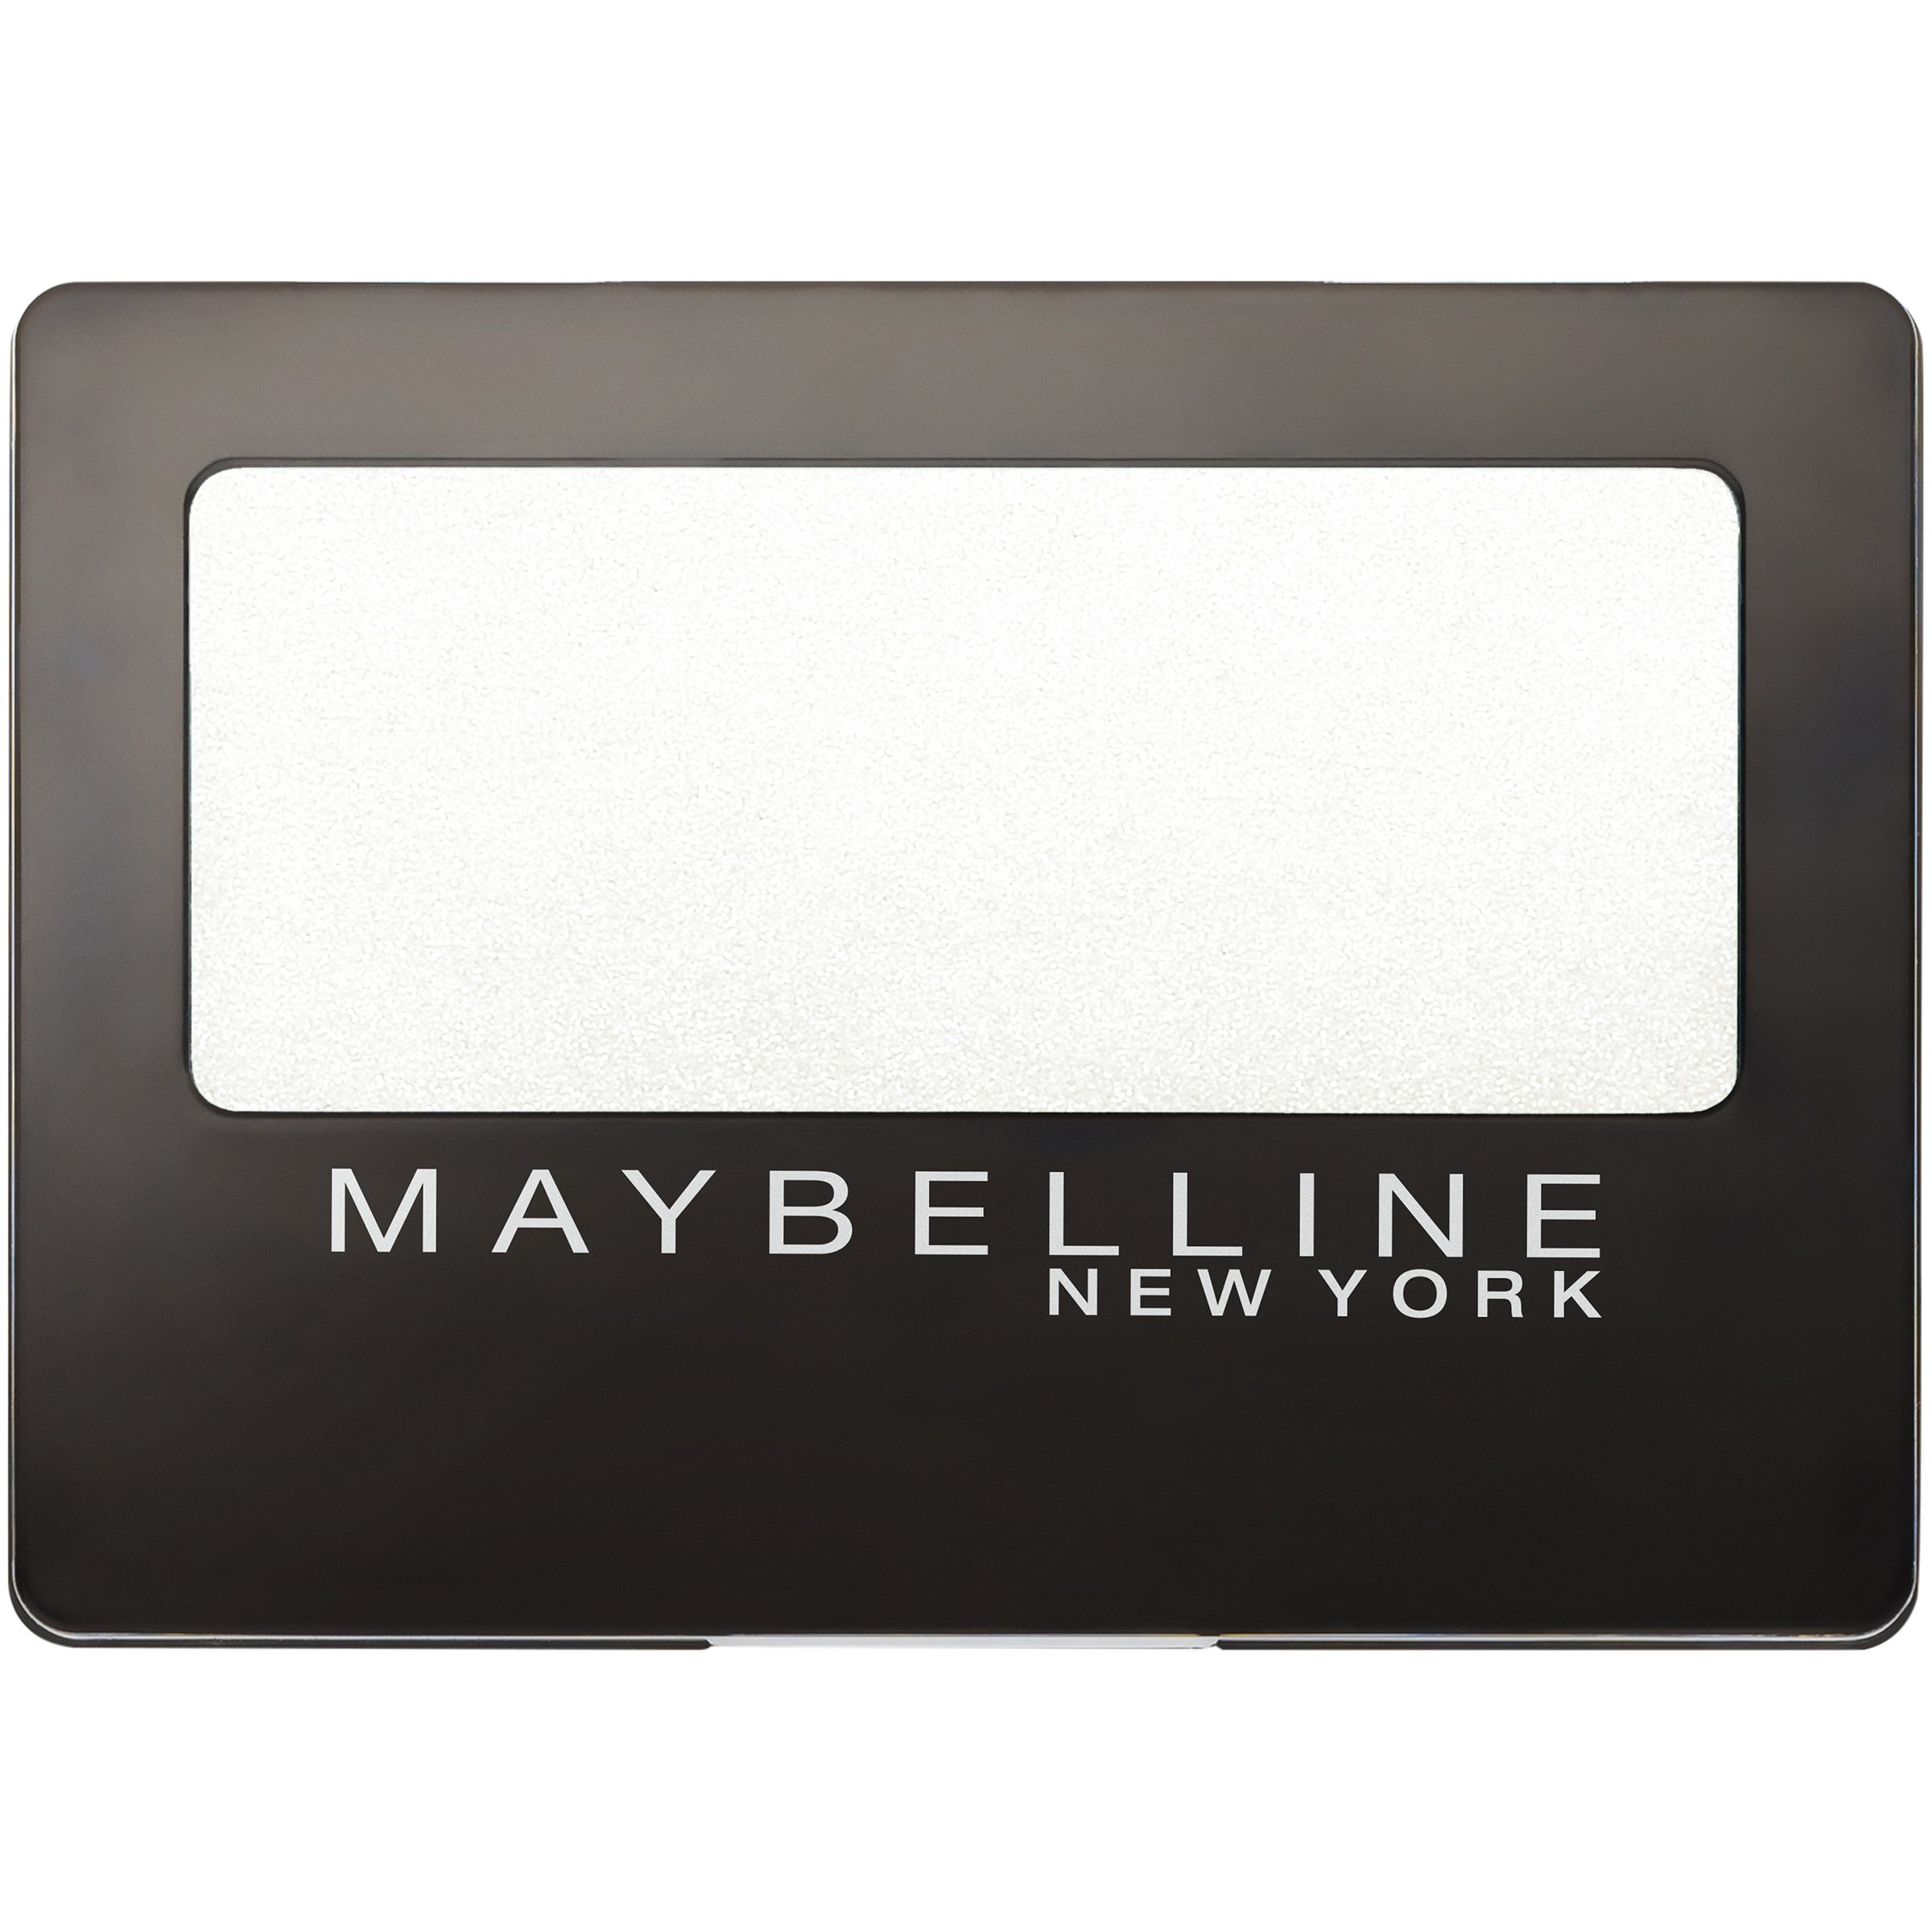 Maybelline New York Expert Wear Eyeshadow, Vanilla, 0.08 oz.